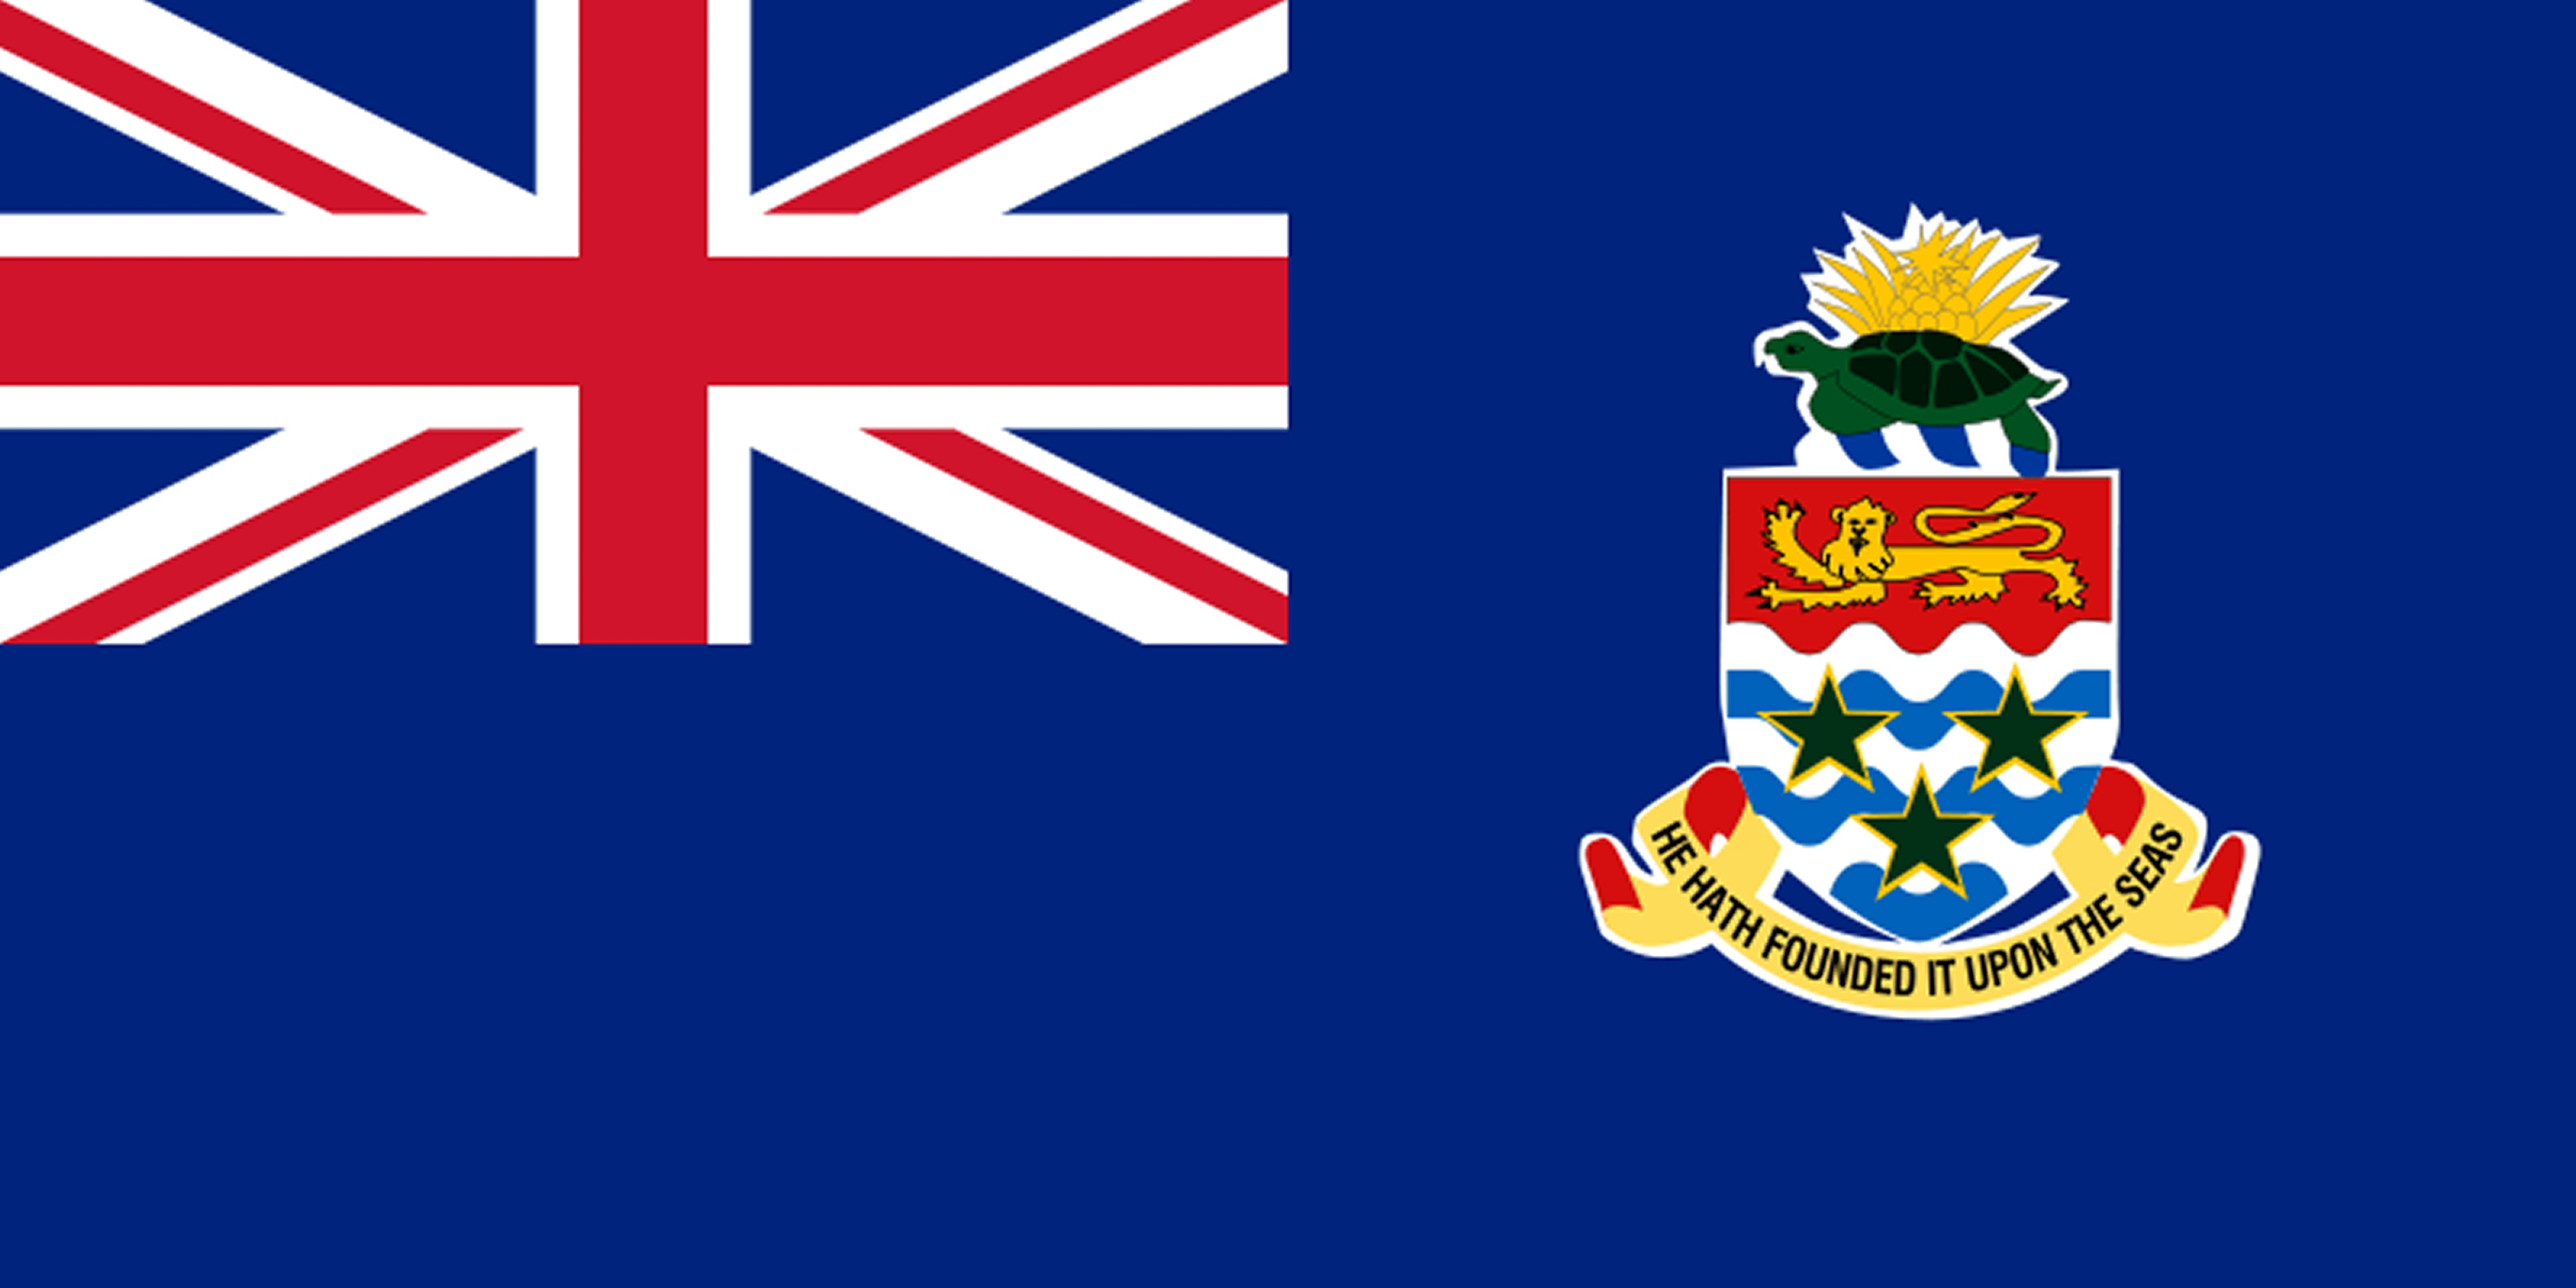 cayman islands flag cayman islands flag cayman islands flag cayman 4800x2400